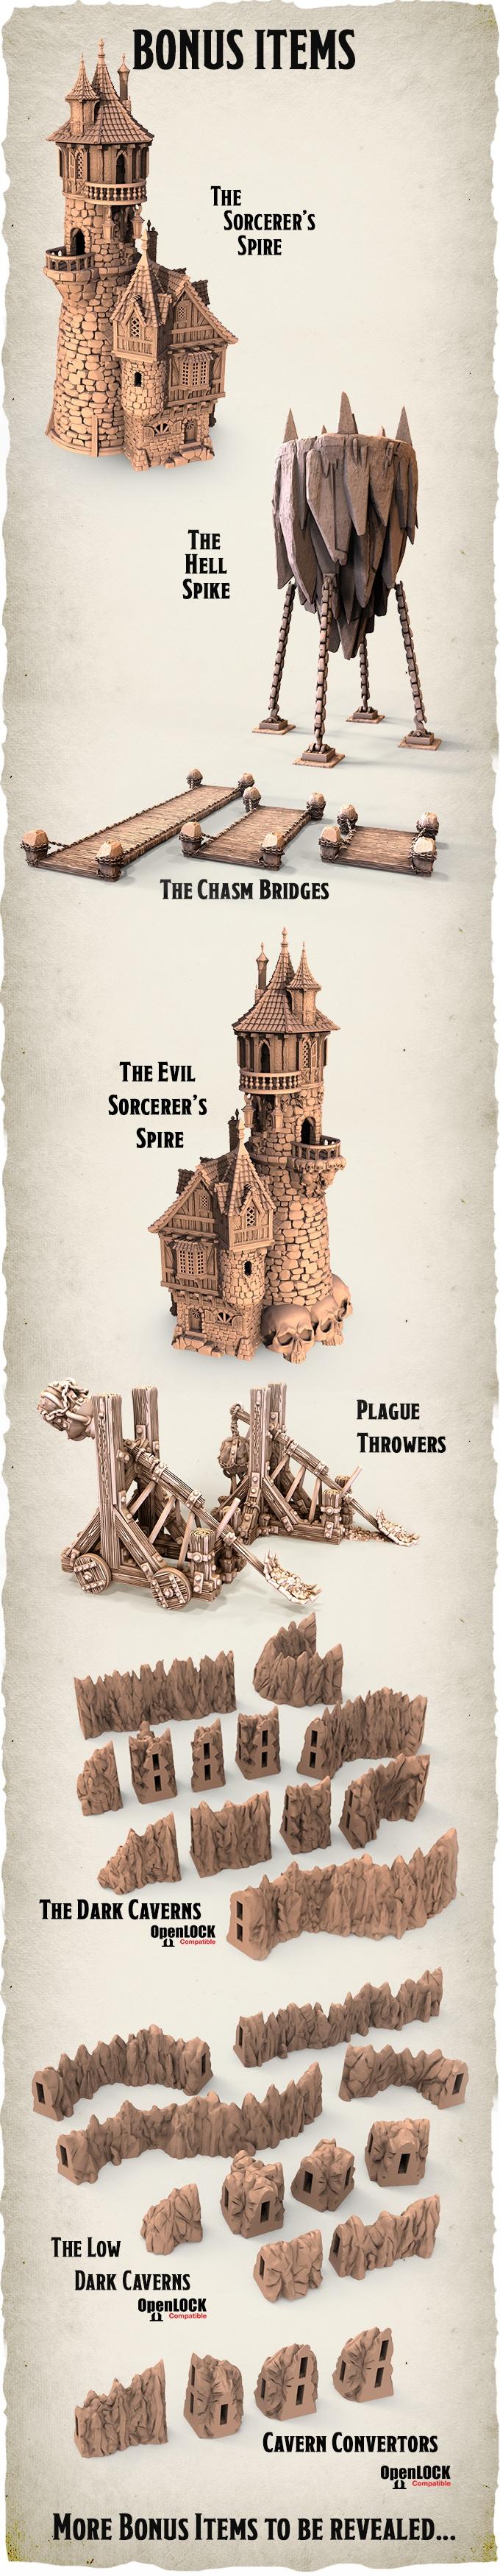 KS] Dwarves, Elves and Demons (by Printable Scenery) UPDATED